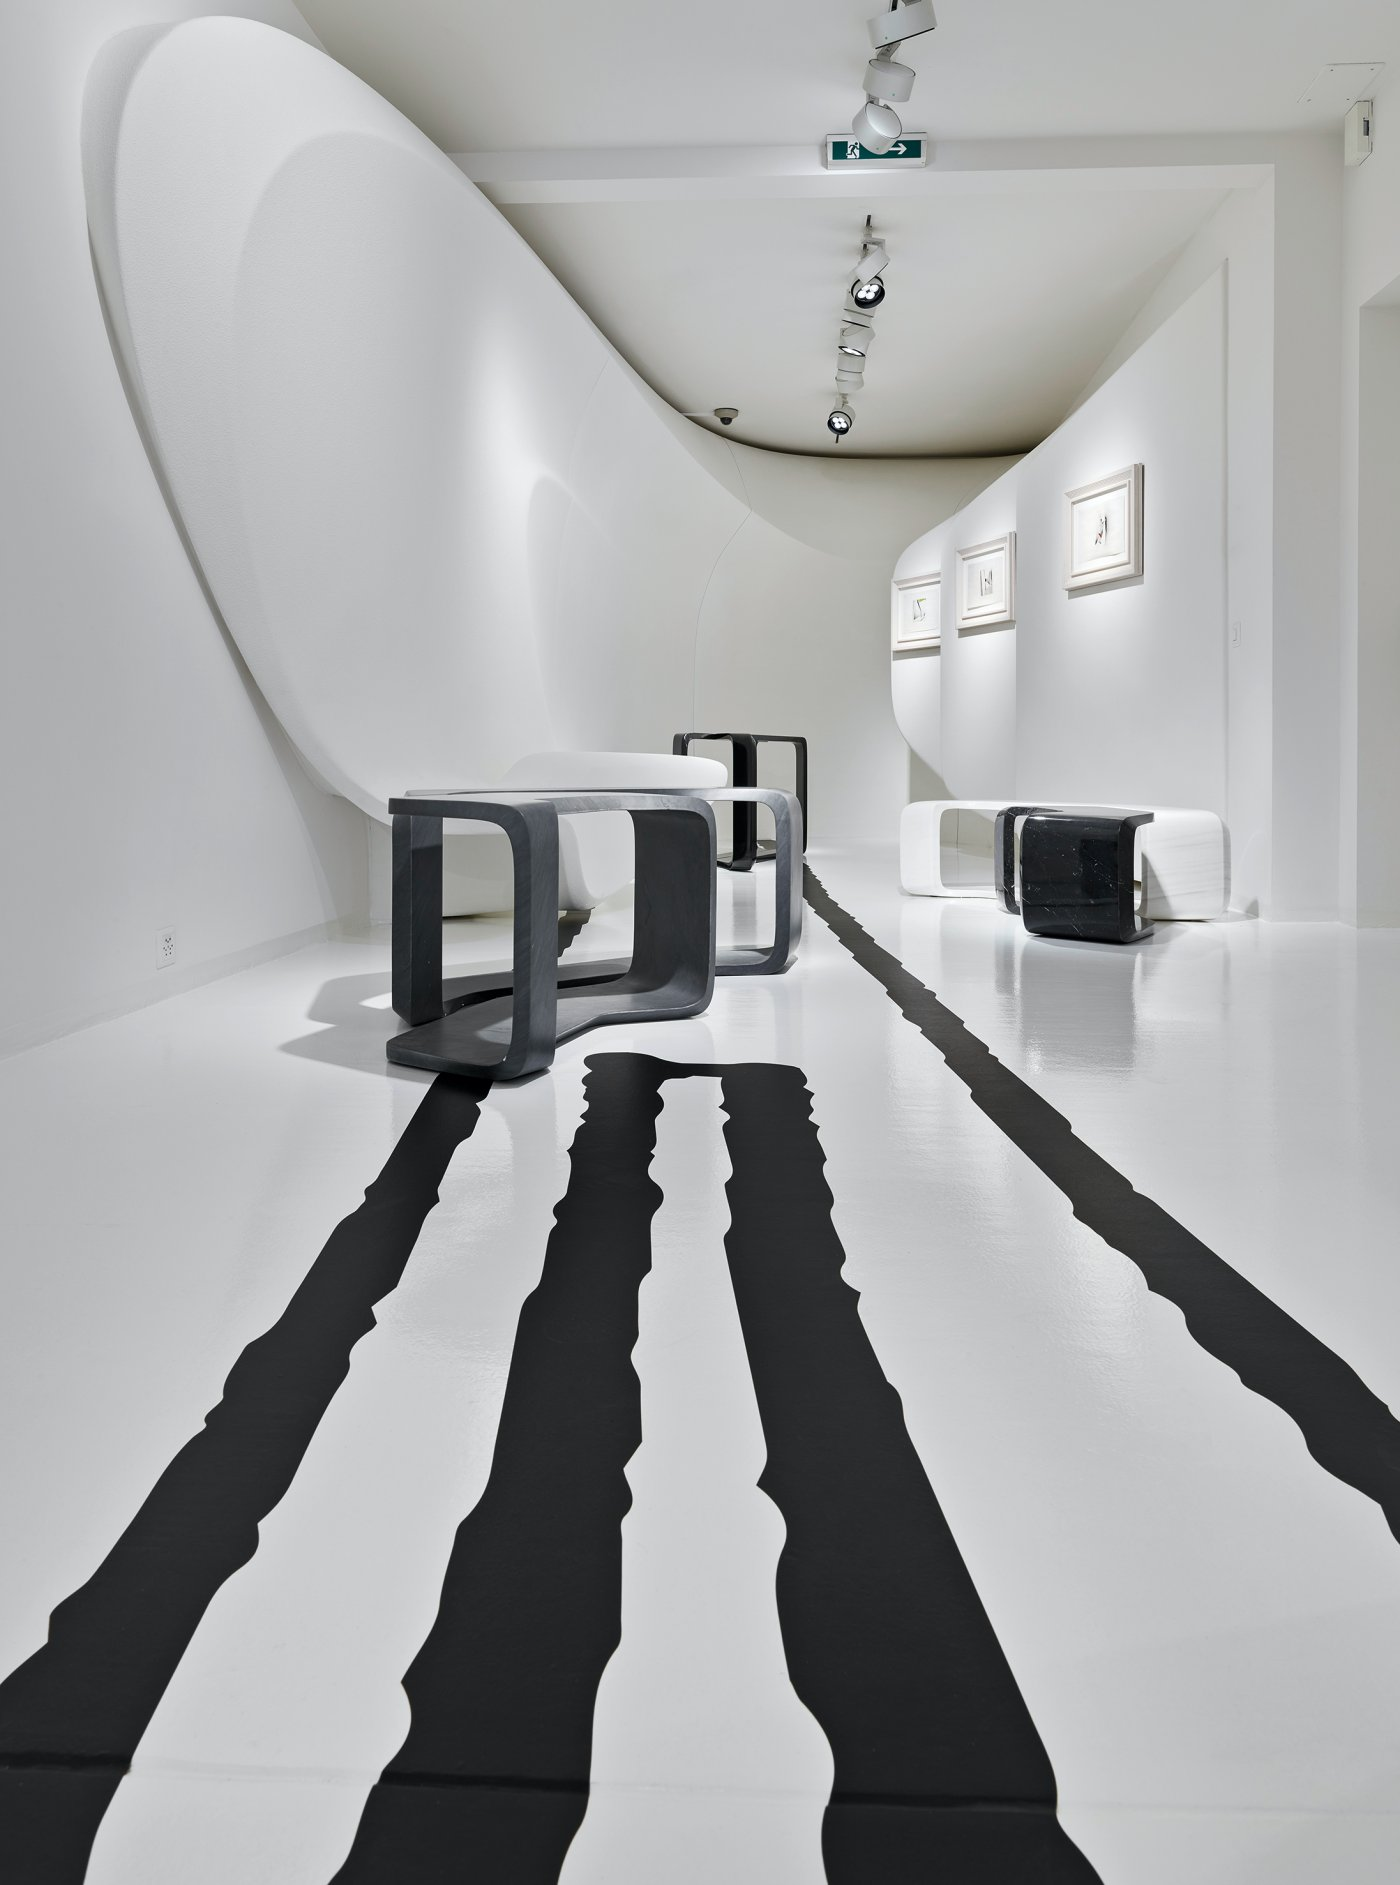 Galerie Gmurzynska Paradeplatz Zaha Hadid 5